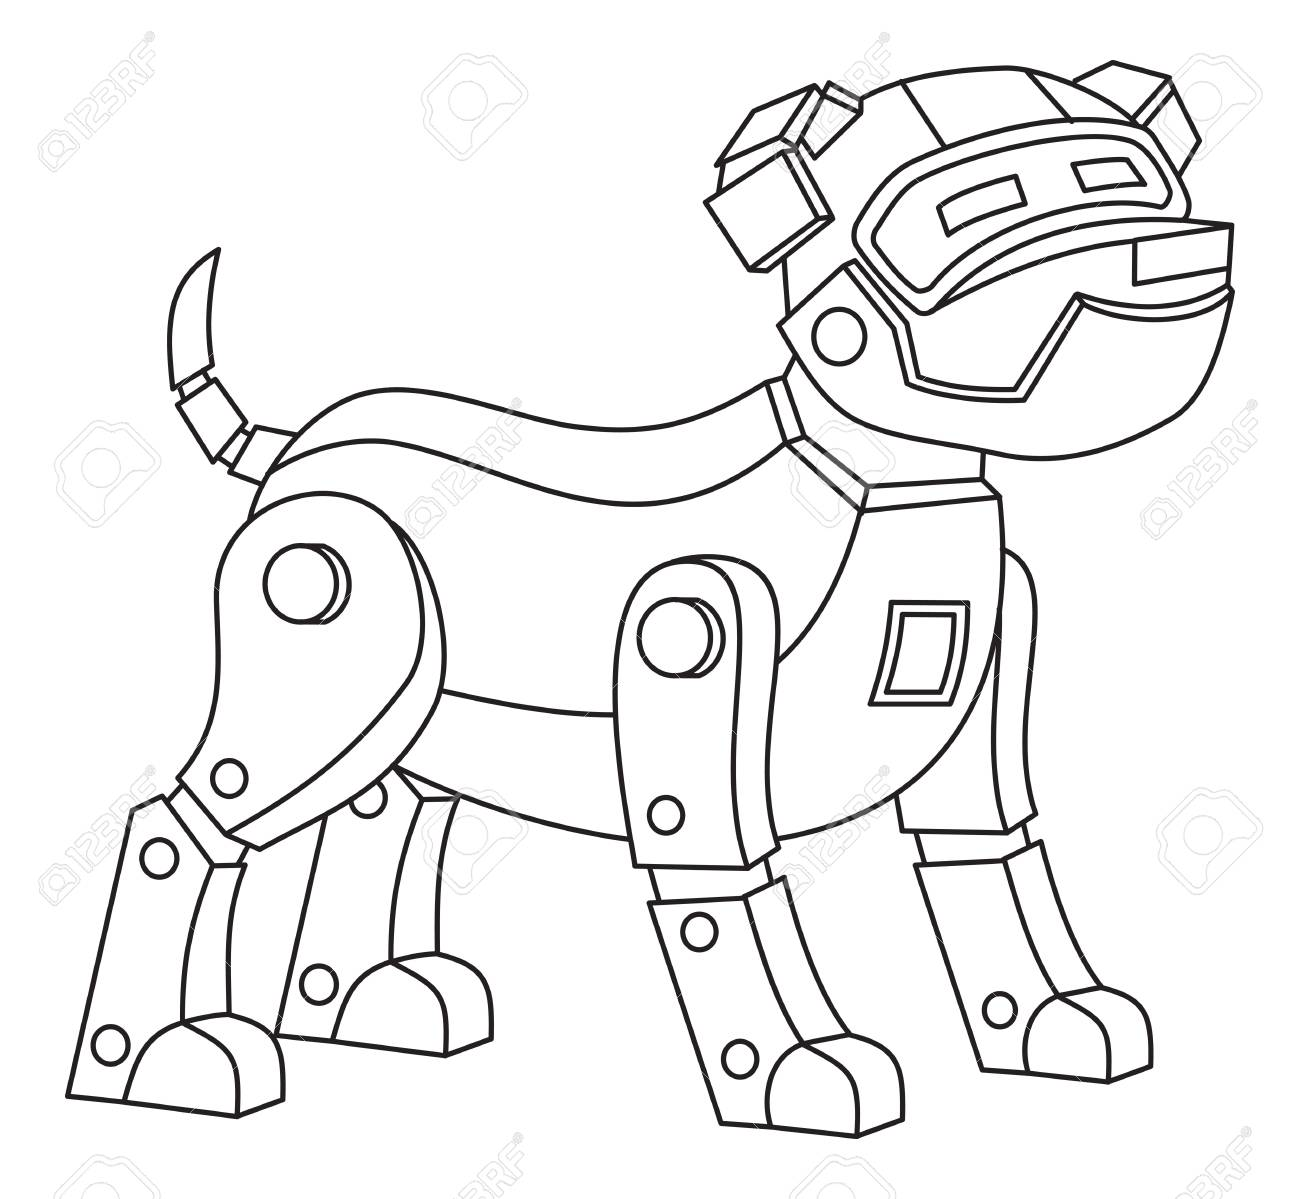 - Robot Dog. Printable Coloring Page For Kids. Lizenzfrei Nutzbare